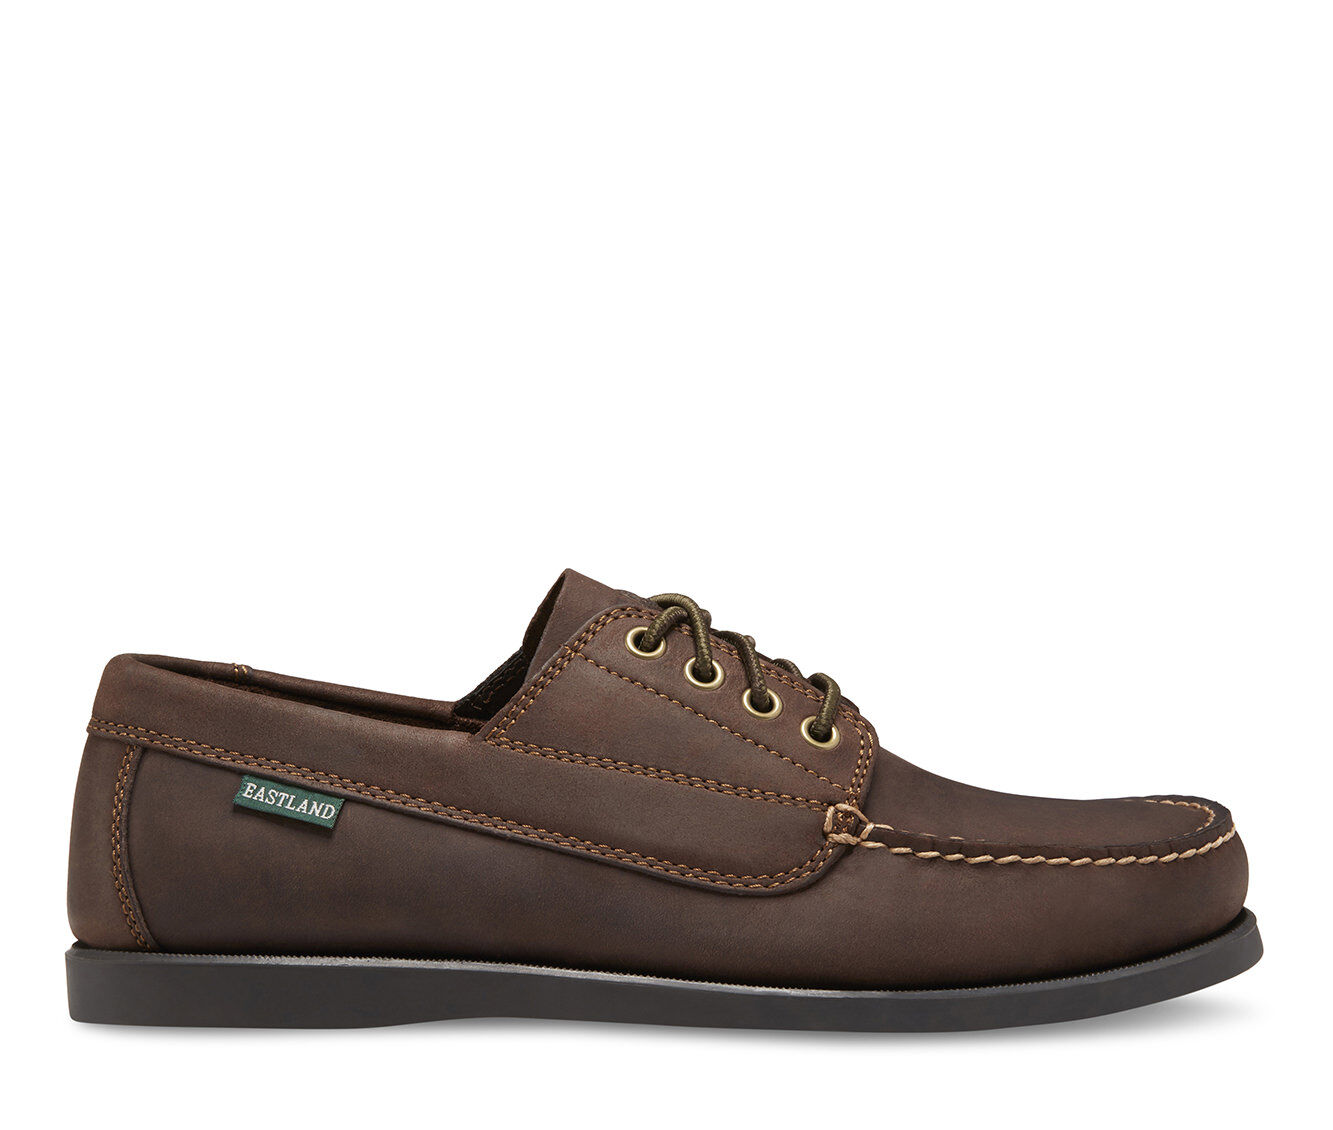 uk shoes_kd2411